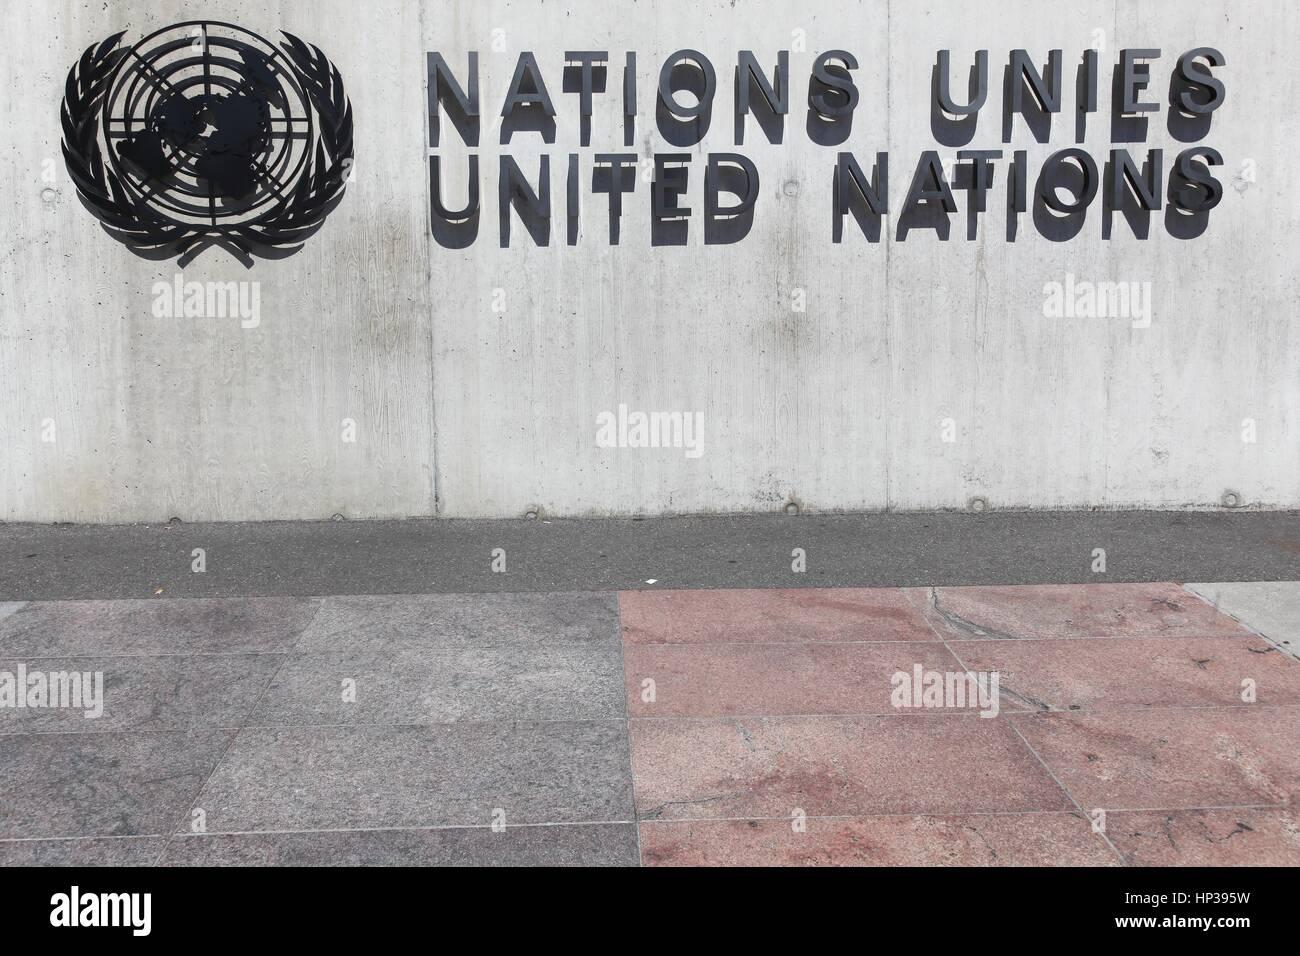 Geneva, Switzerland - August 14, 2016:  United Nations sign on a wall in Geneva, Switzerland - Stock Image